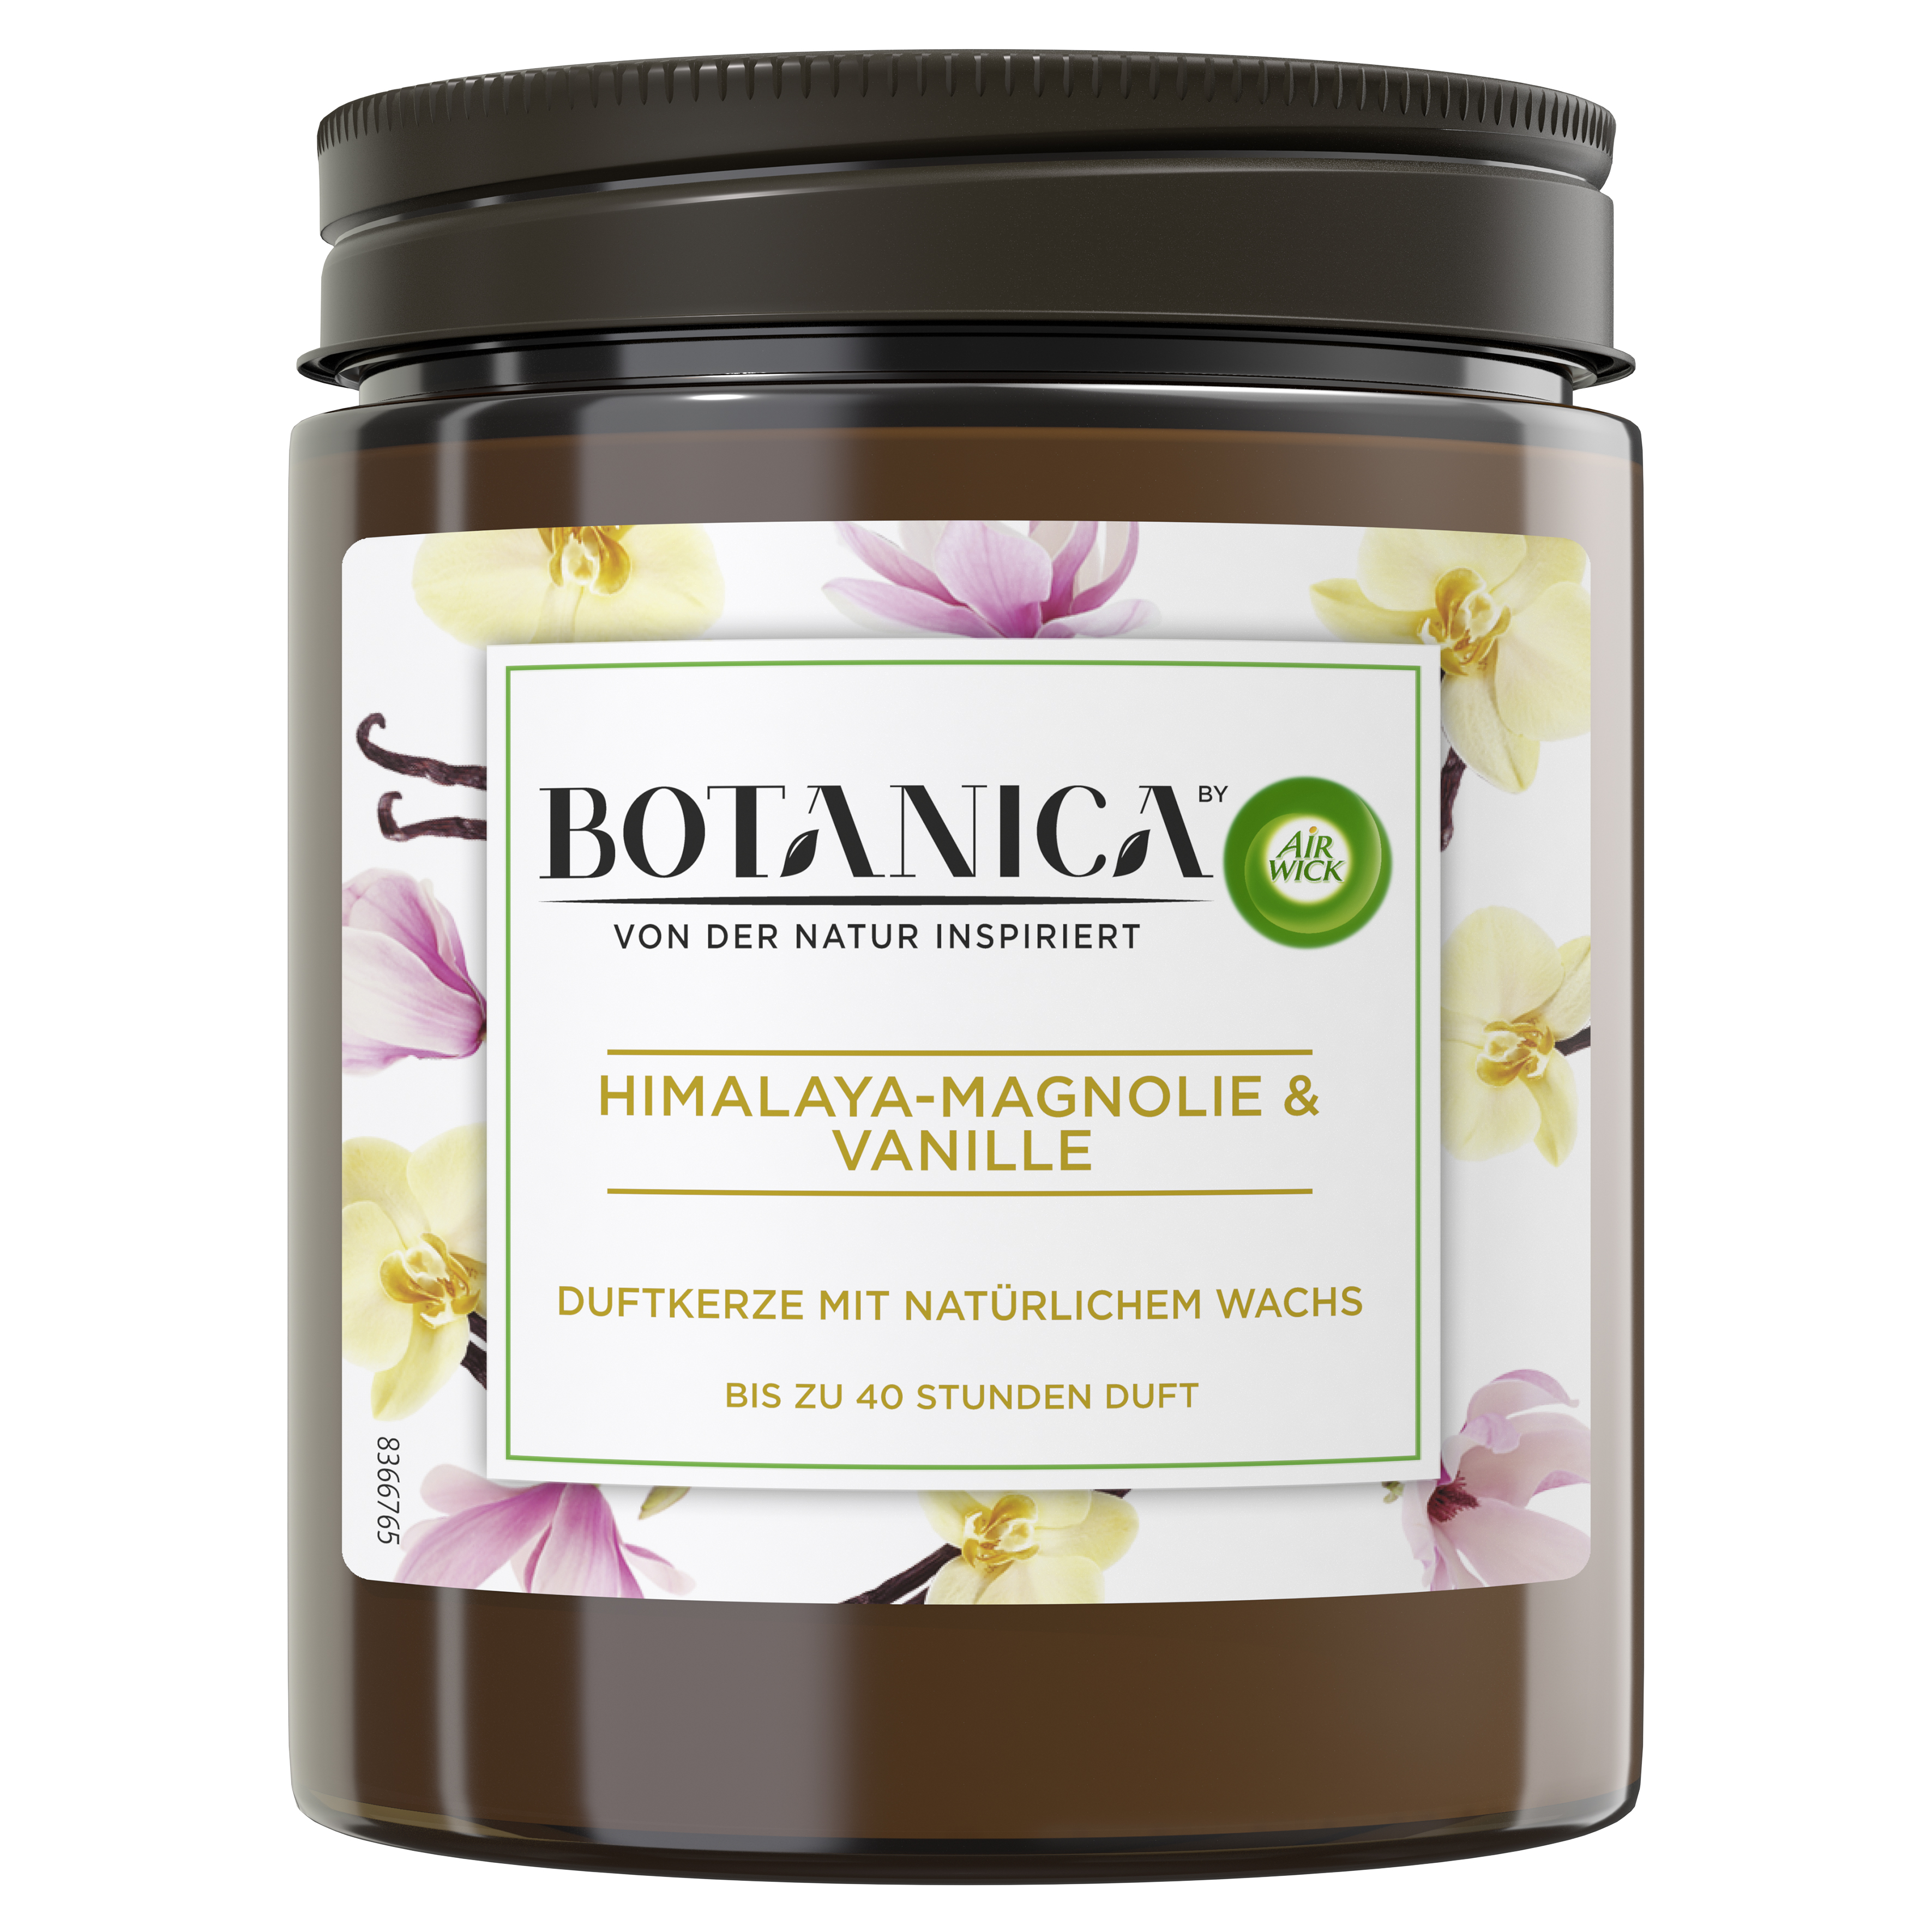 Air Wick Botanica Duftkerze Himalaya-Magnolie & Vanille